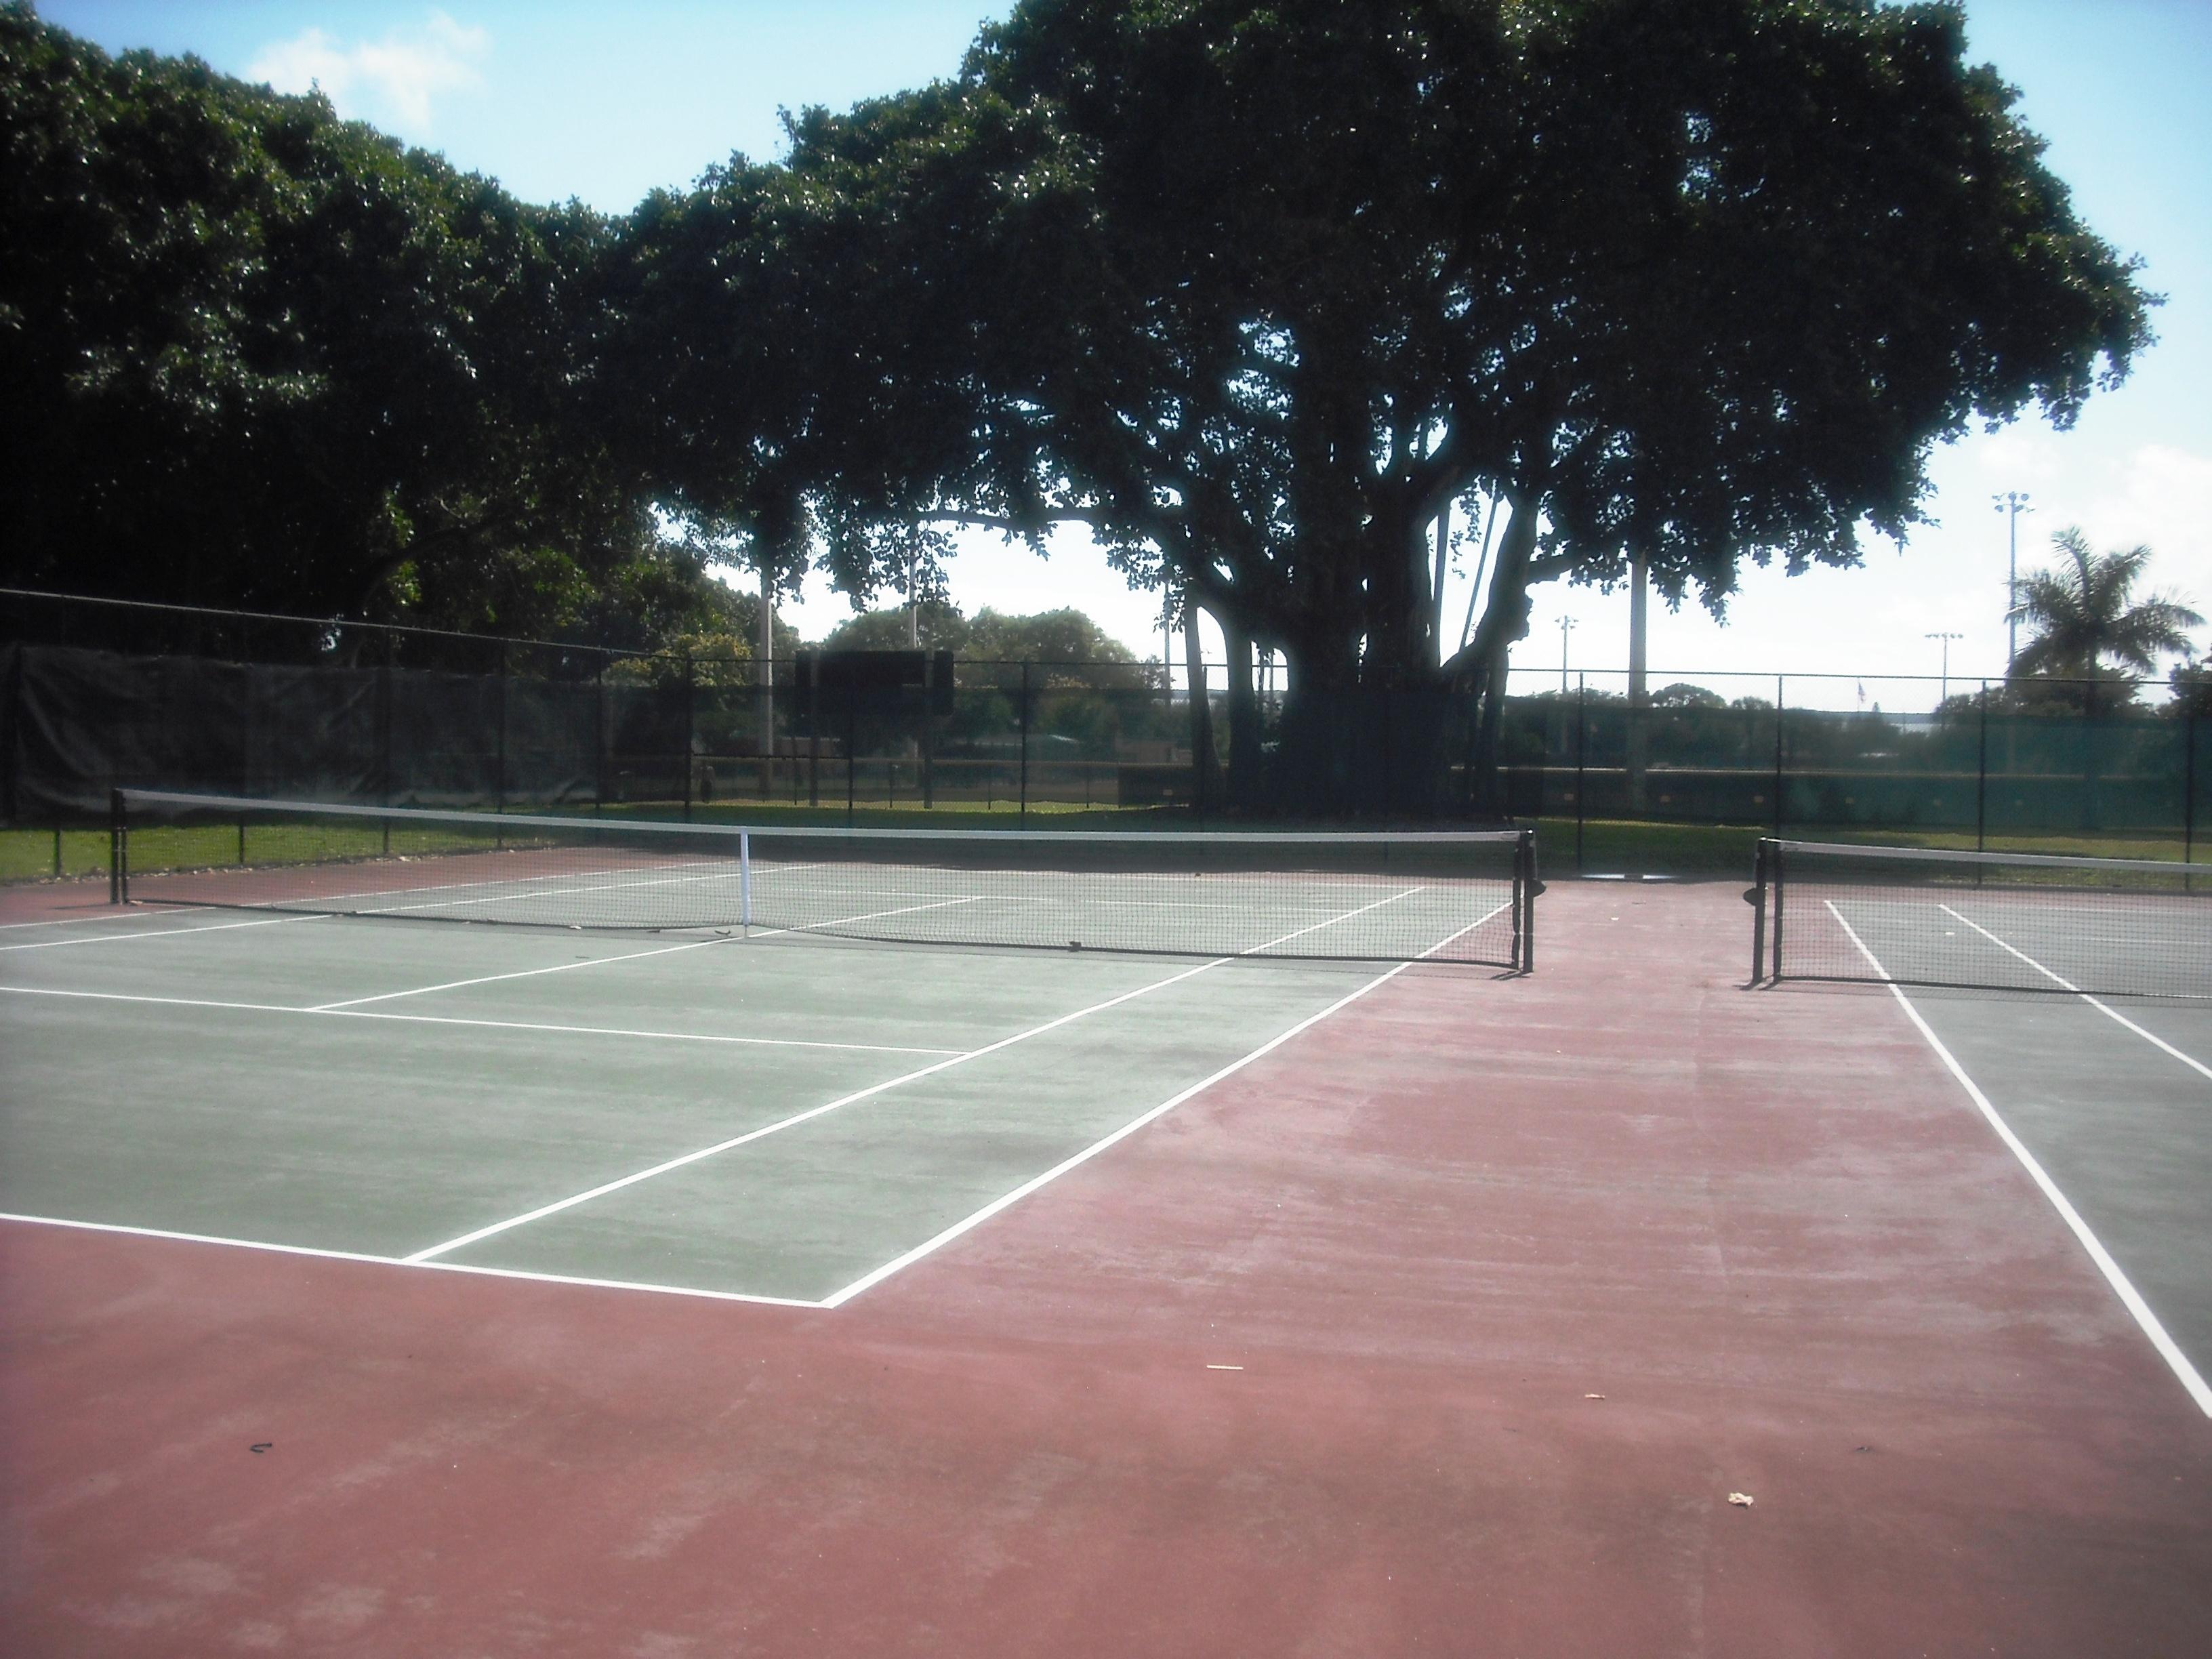 Phipps park tennis 2 20 2013 002 west palm beach parks - Palm beach gardens tennis center ...